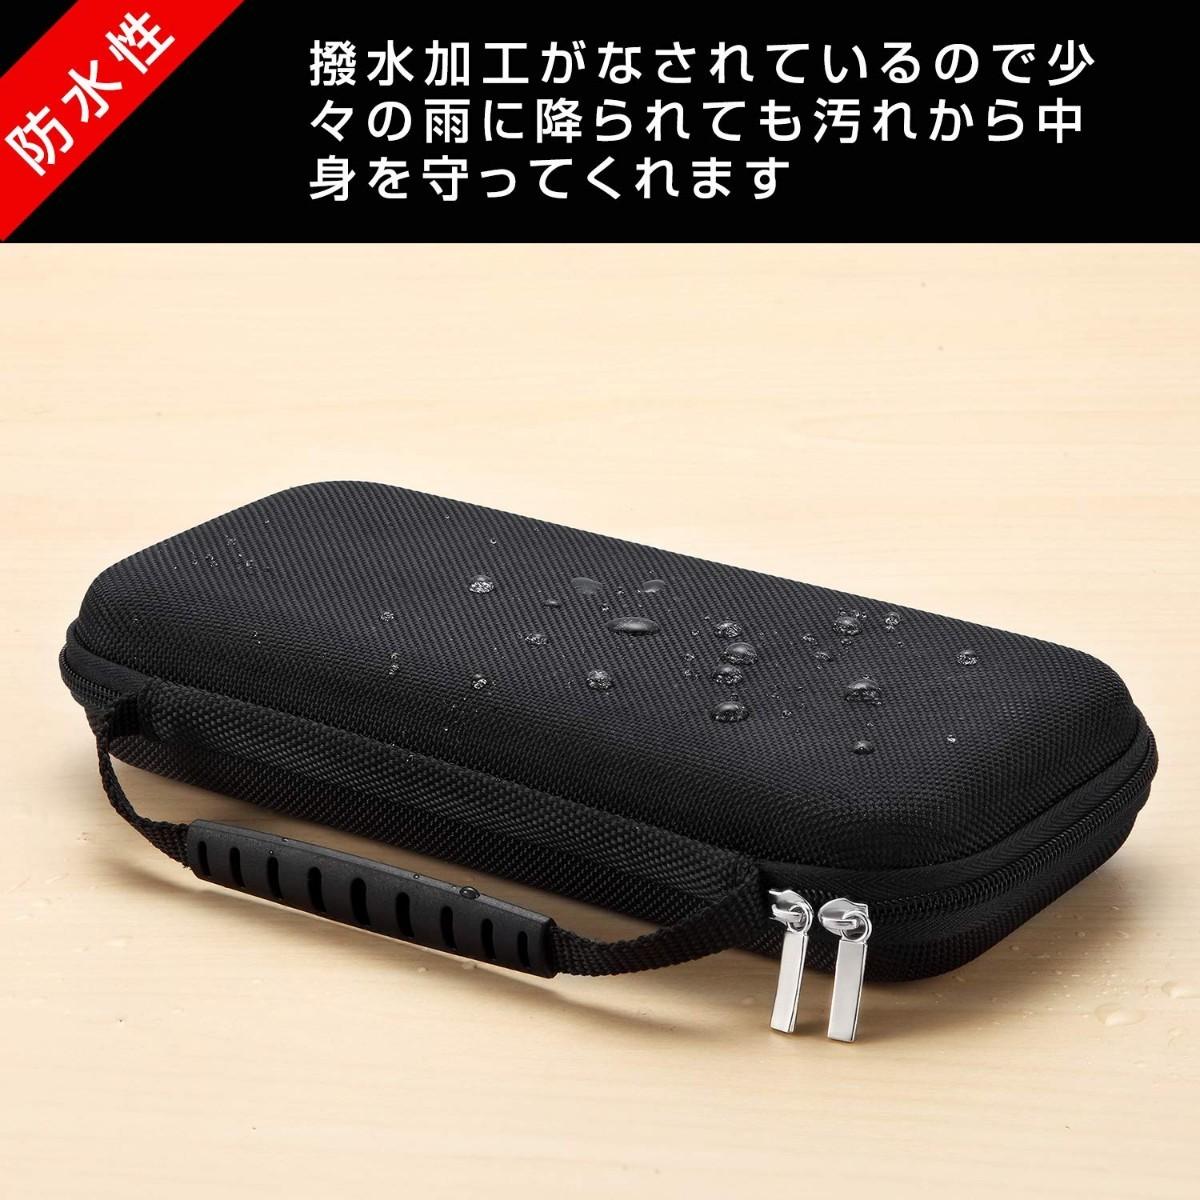 Nintendo Switch Lite ケース  収納バッグ